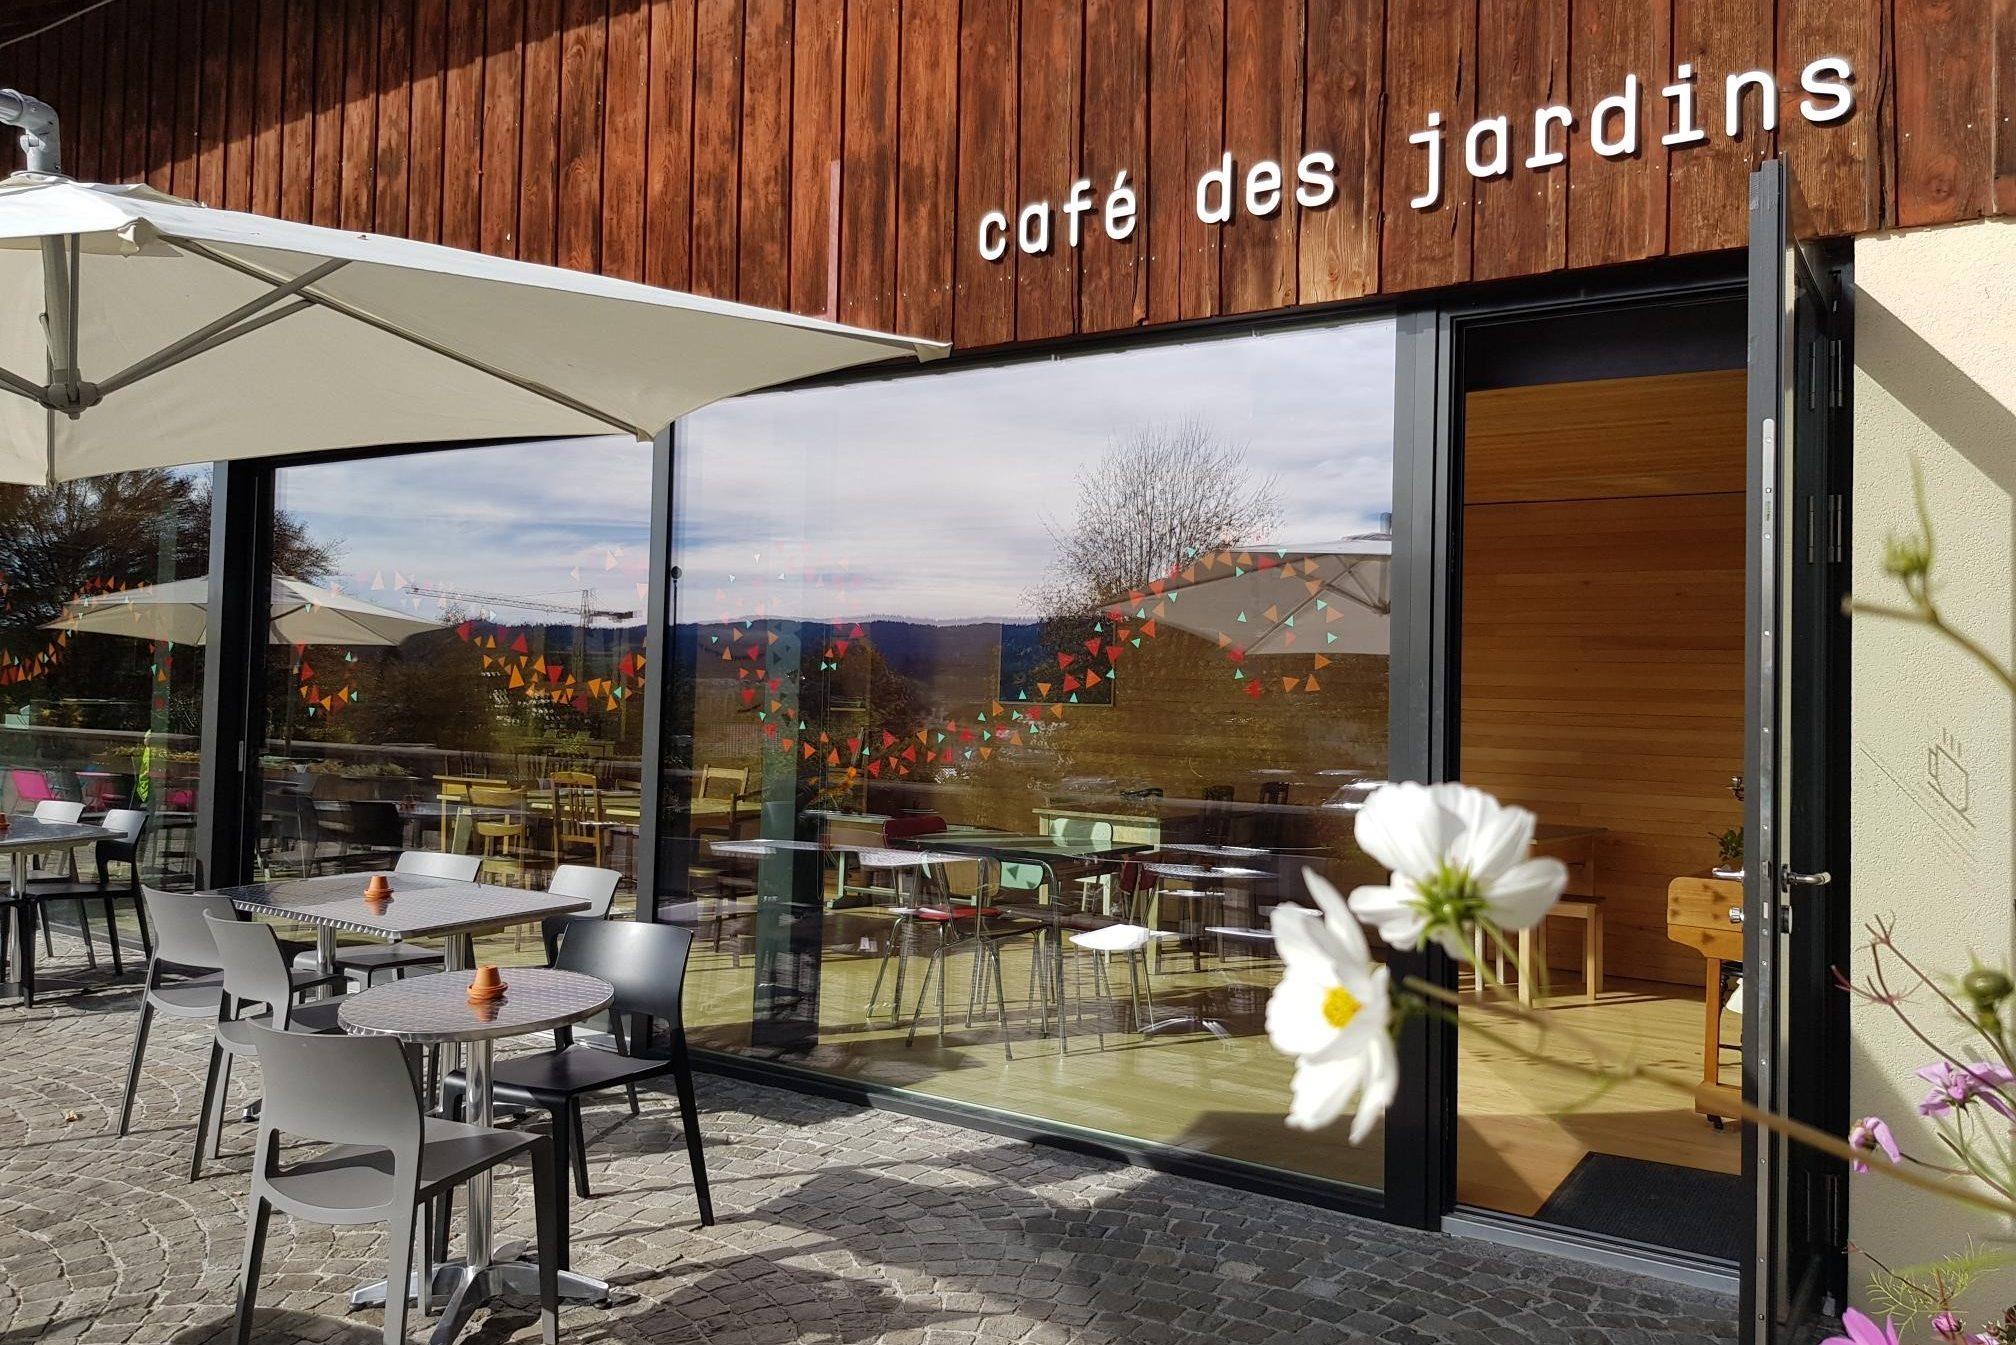 Café des jardins